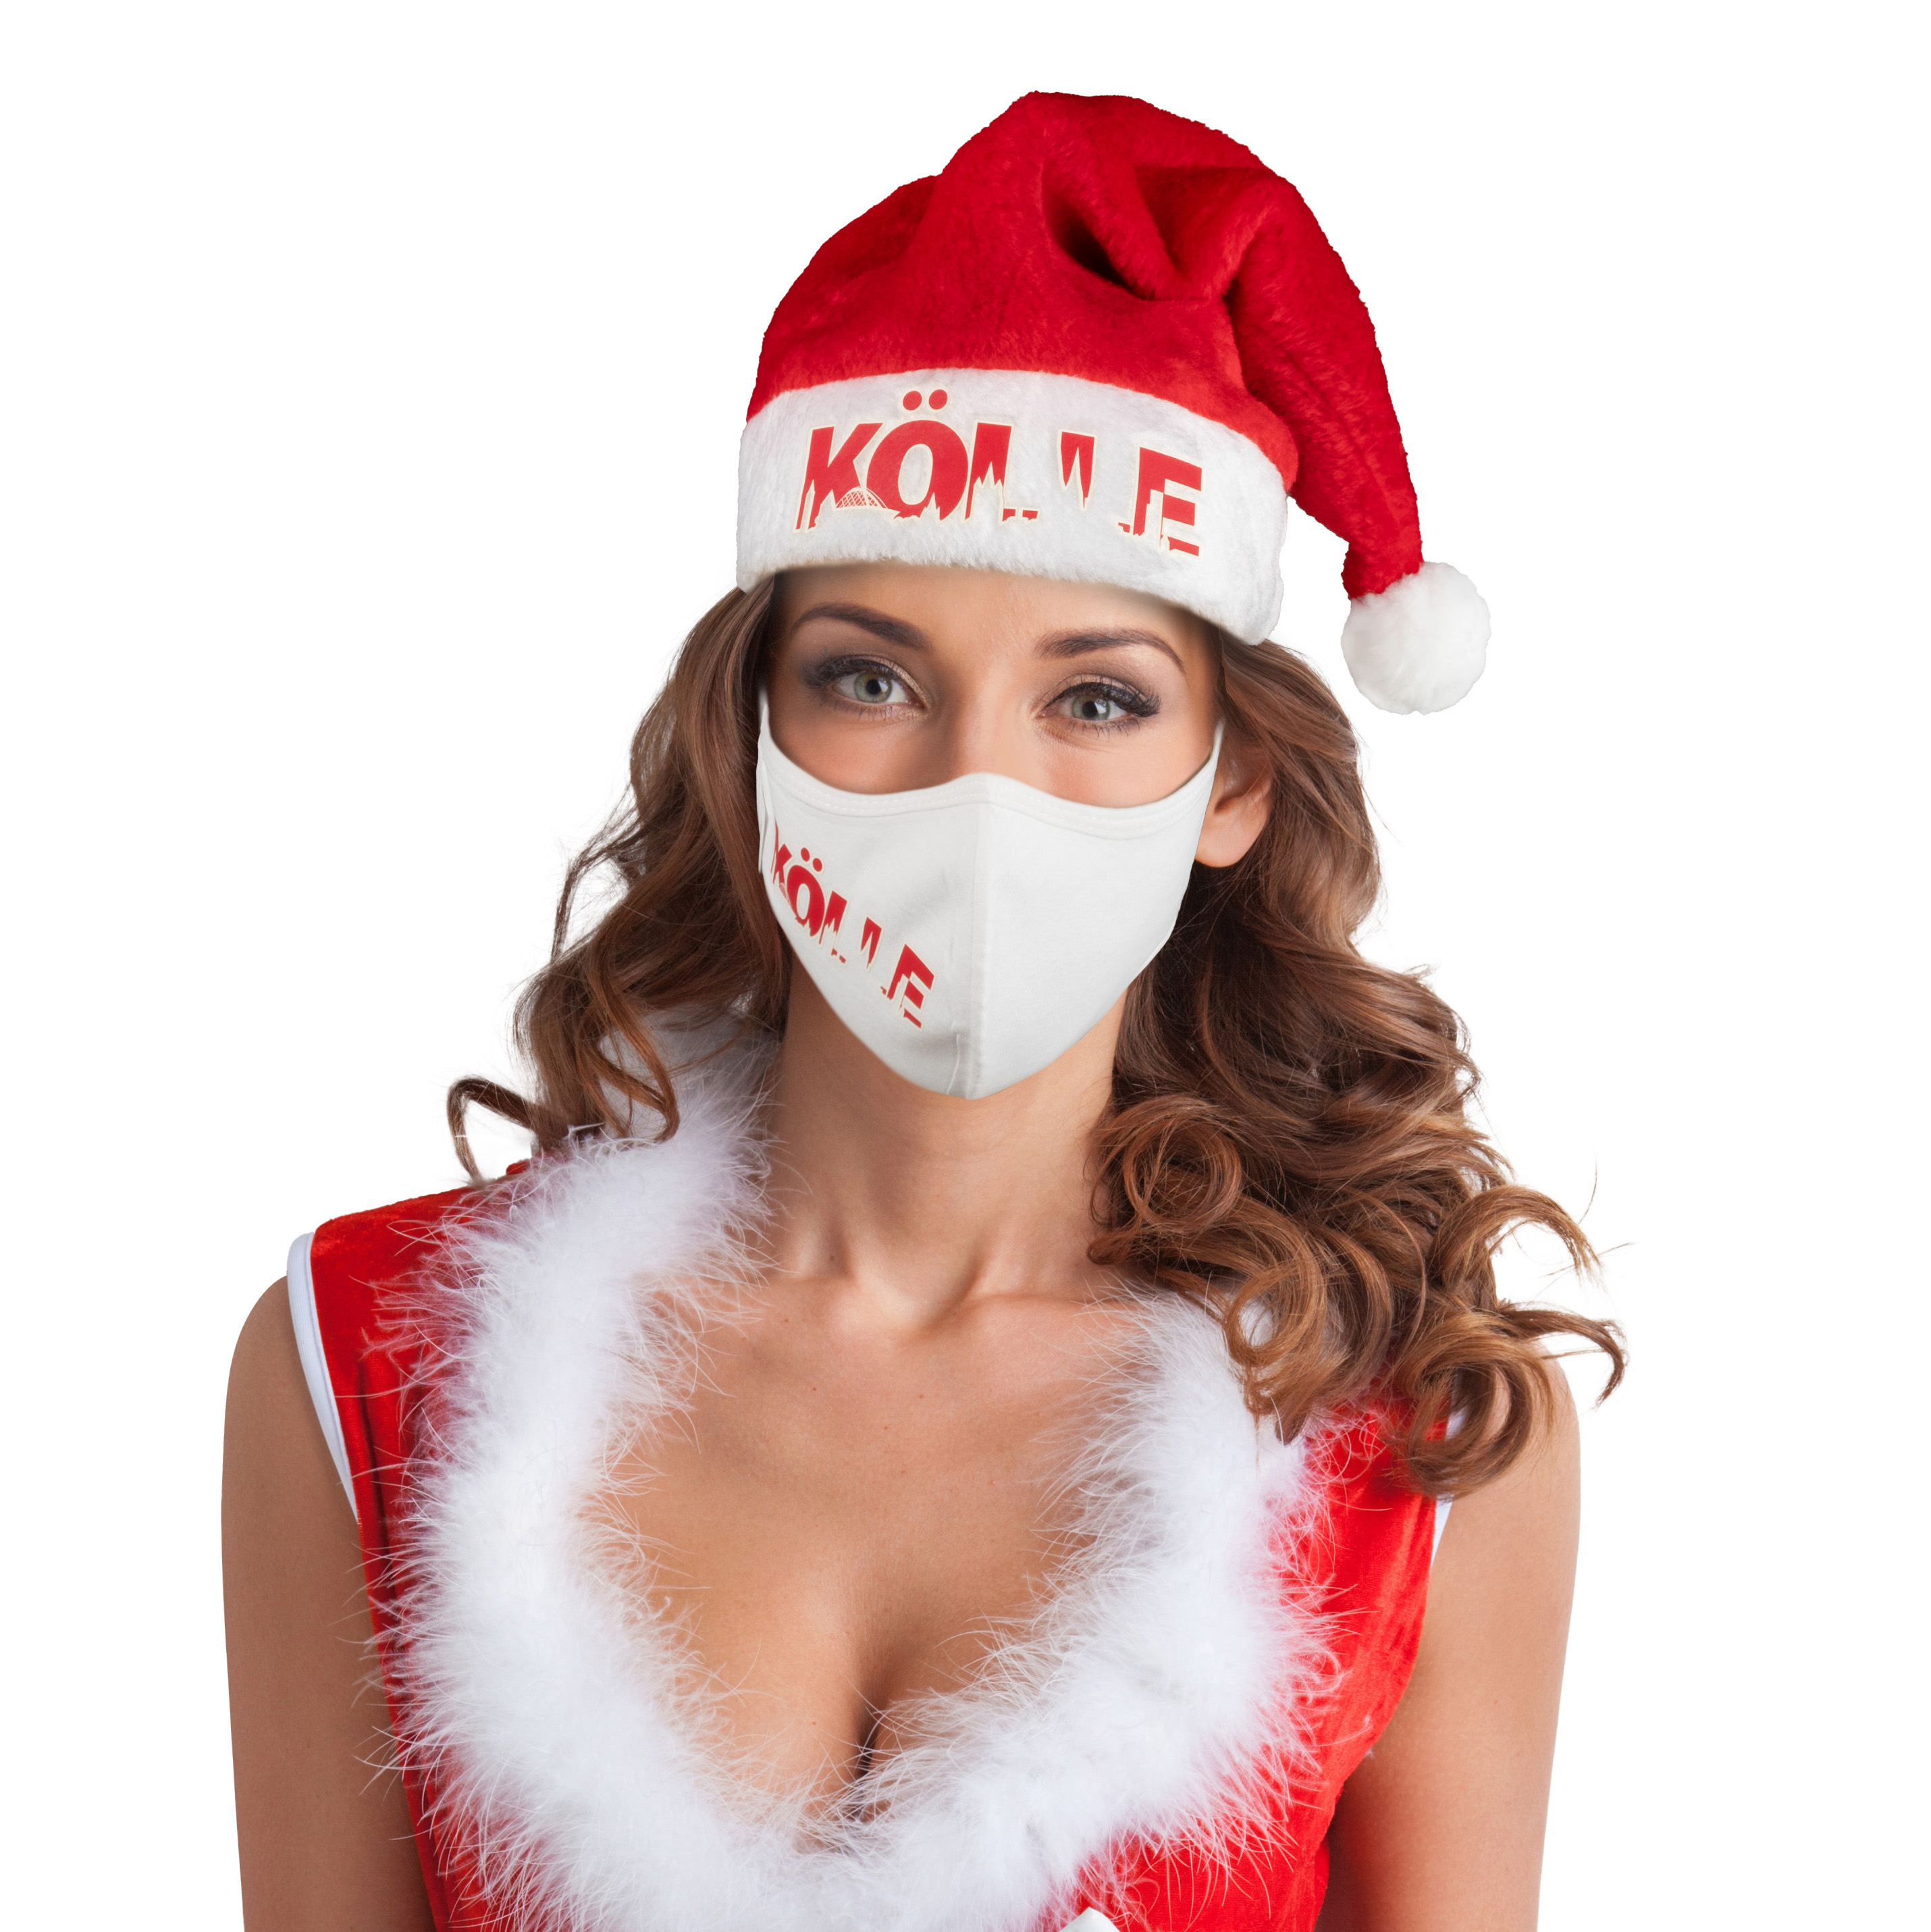 Weihnachts-Set Maske + Mütze Kölle Skyline